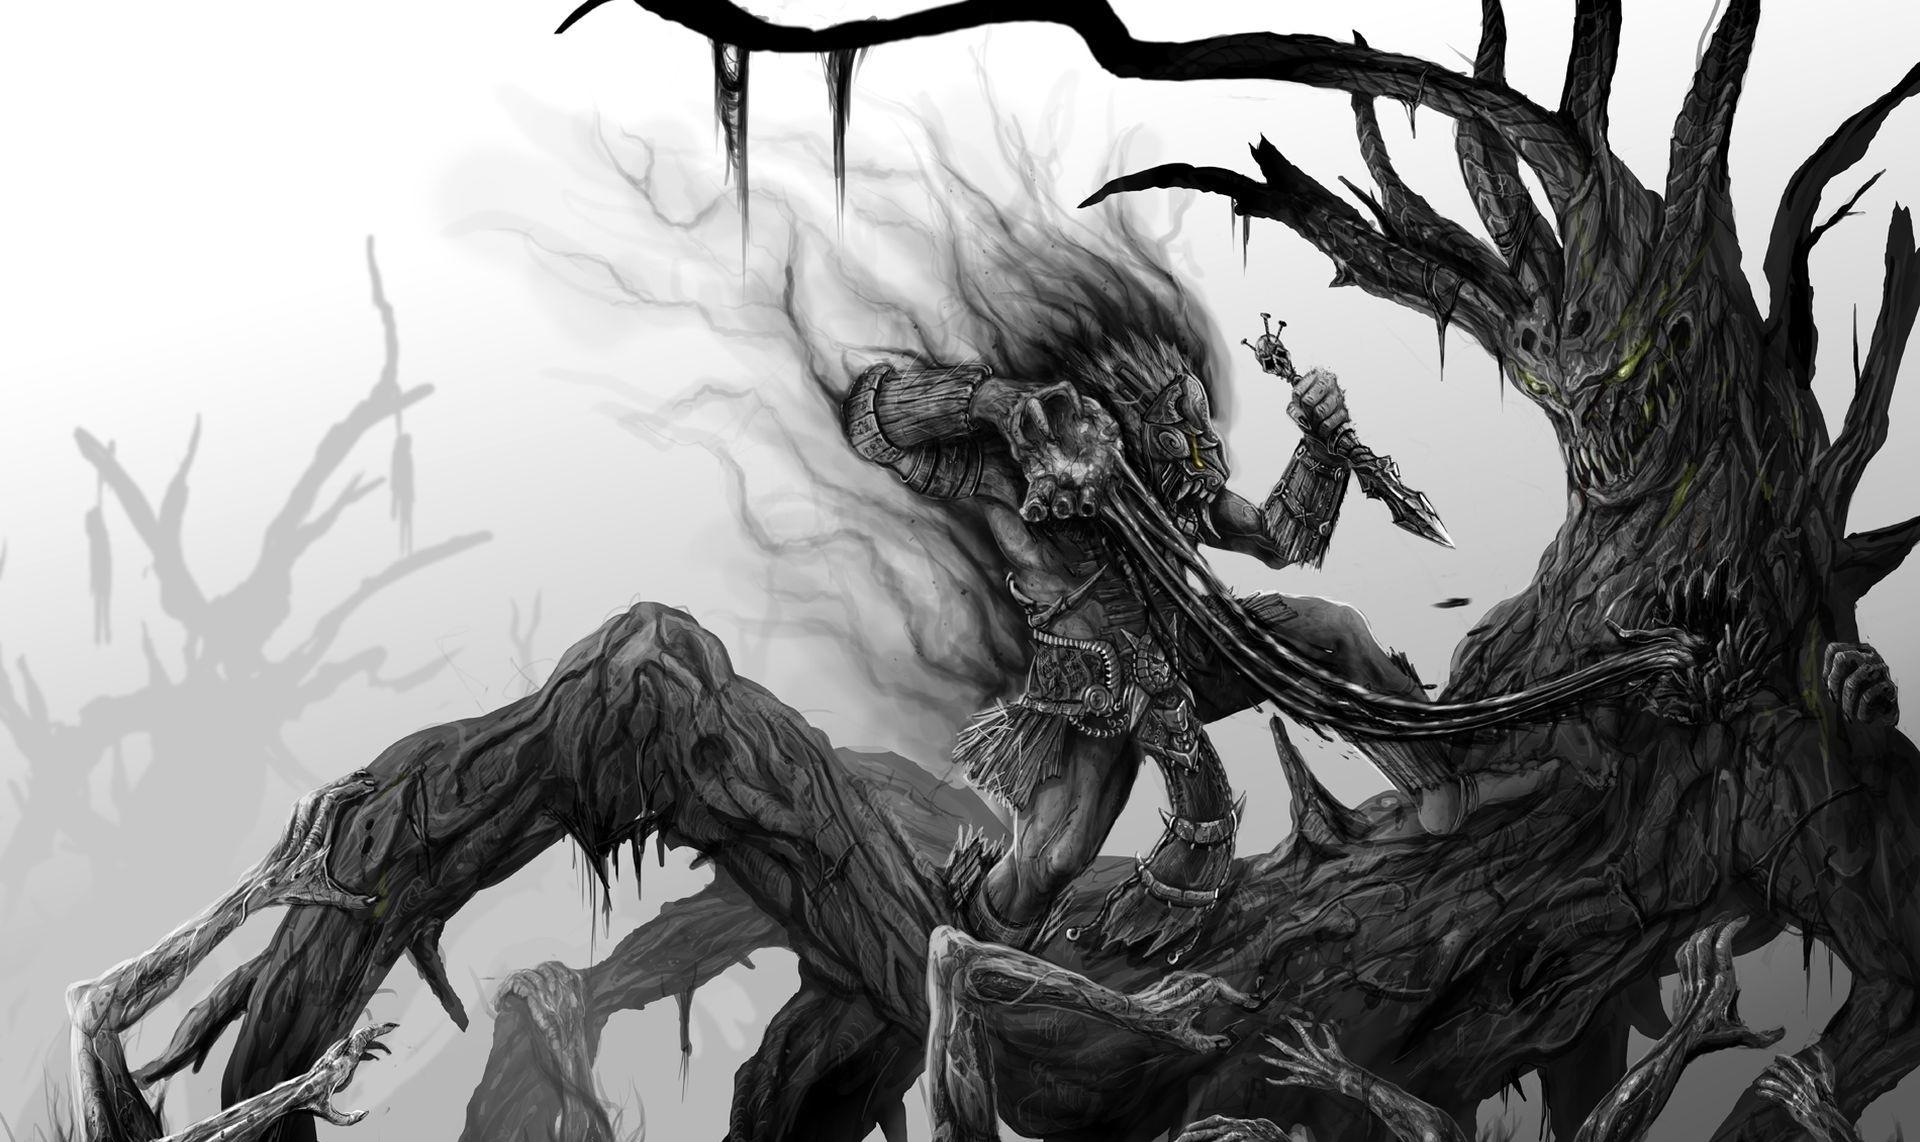 Dark fantasy warrior monster creatures weapon horror scary creepy spooky  art battle wallpaper     28273   WallpaperUP